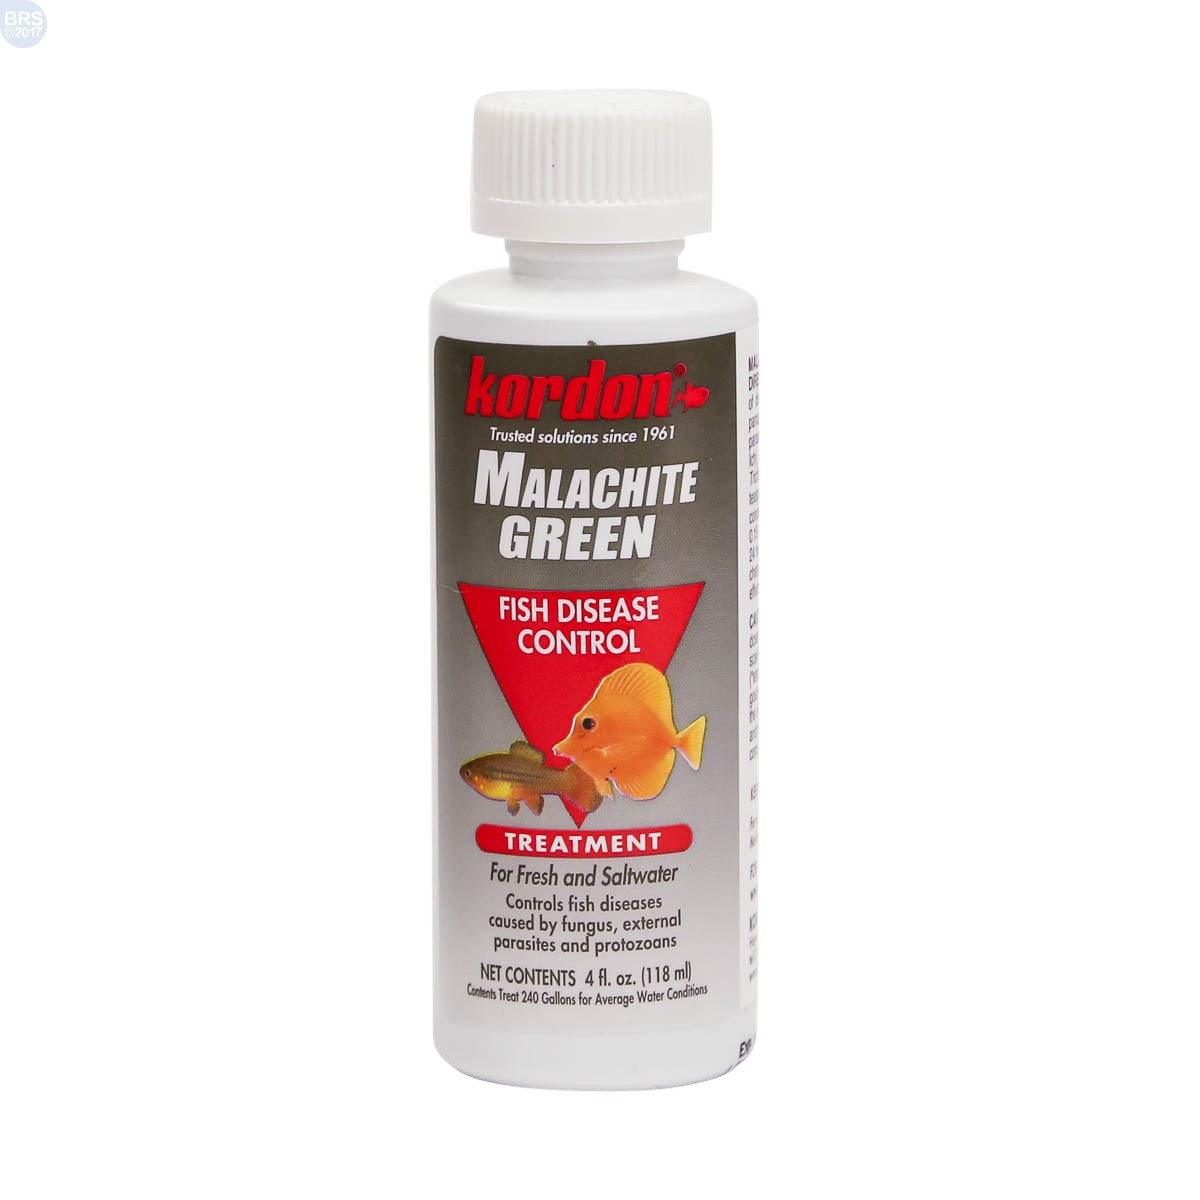 malachite green fish disease control kordon bulk reef